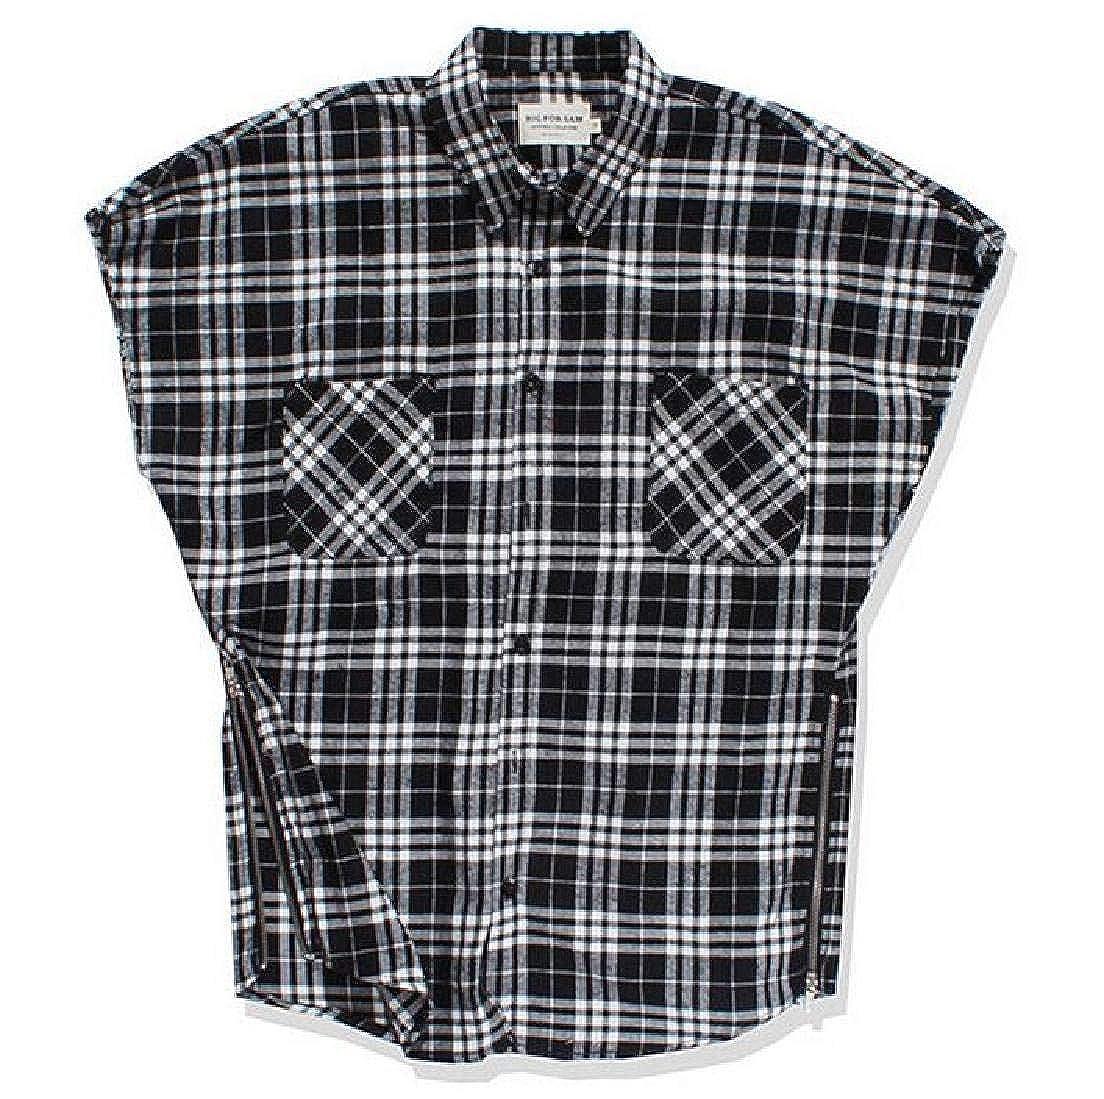 Jofemuho Mens Casual Sleeveless Pockets Hip Hop Plaid Print Button Down Shirts